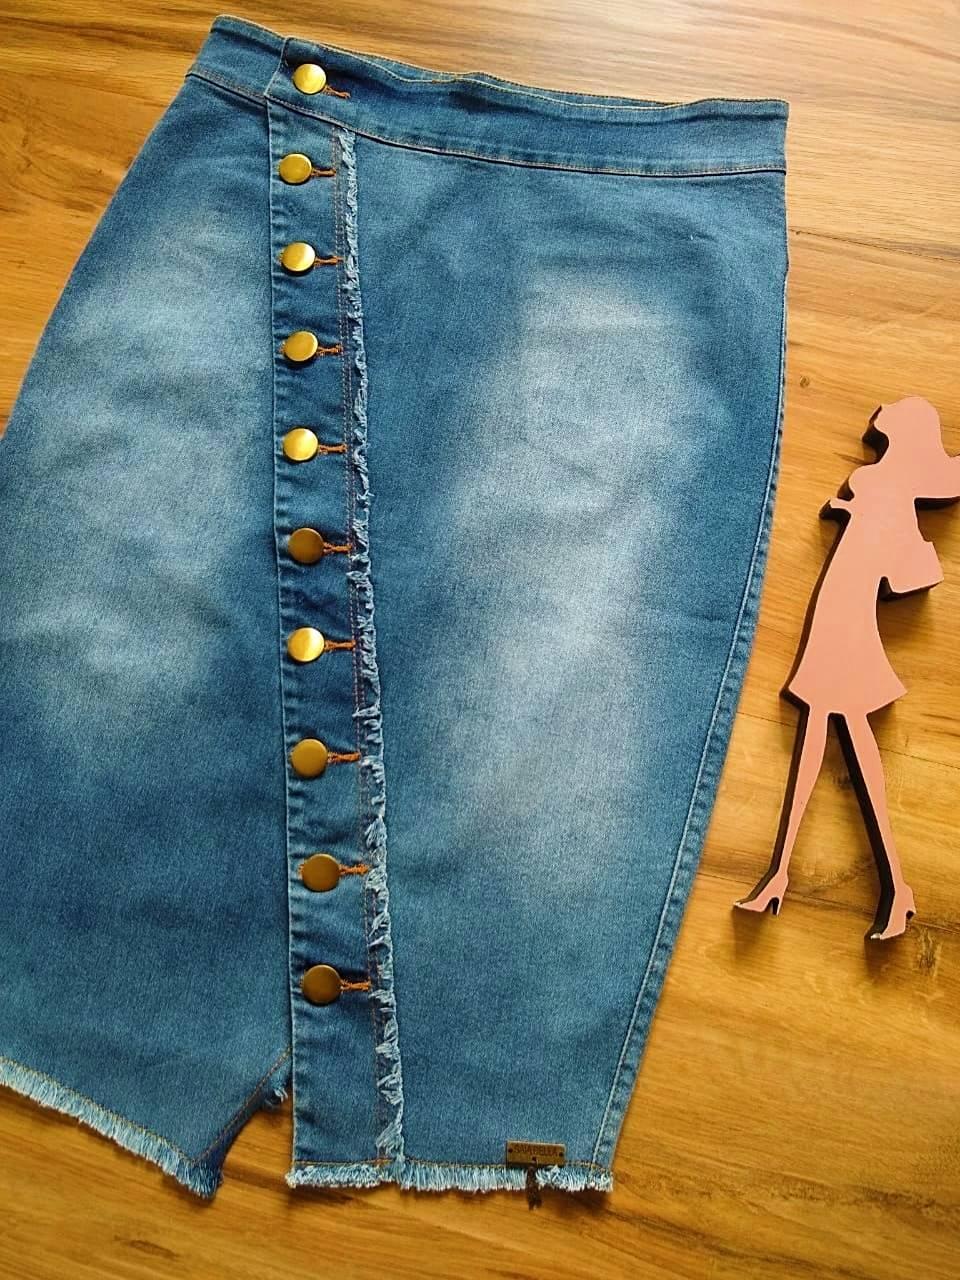 Saia Jeans Flávia SAIA BELLA SB707180 - azul claro